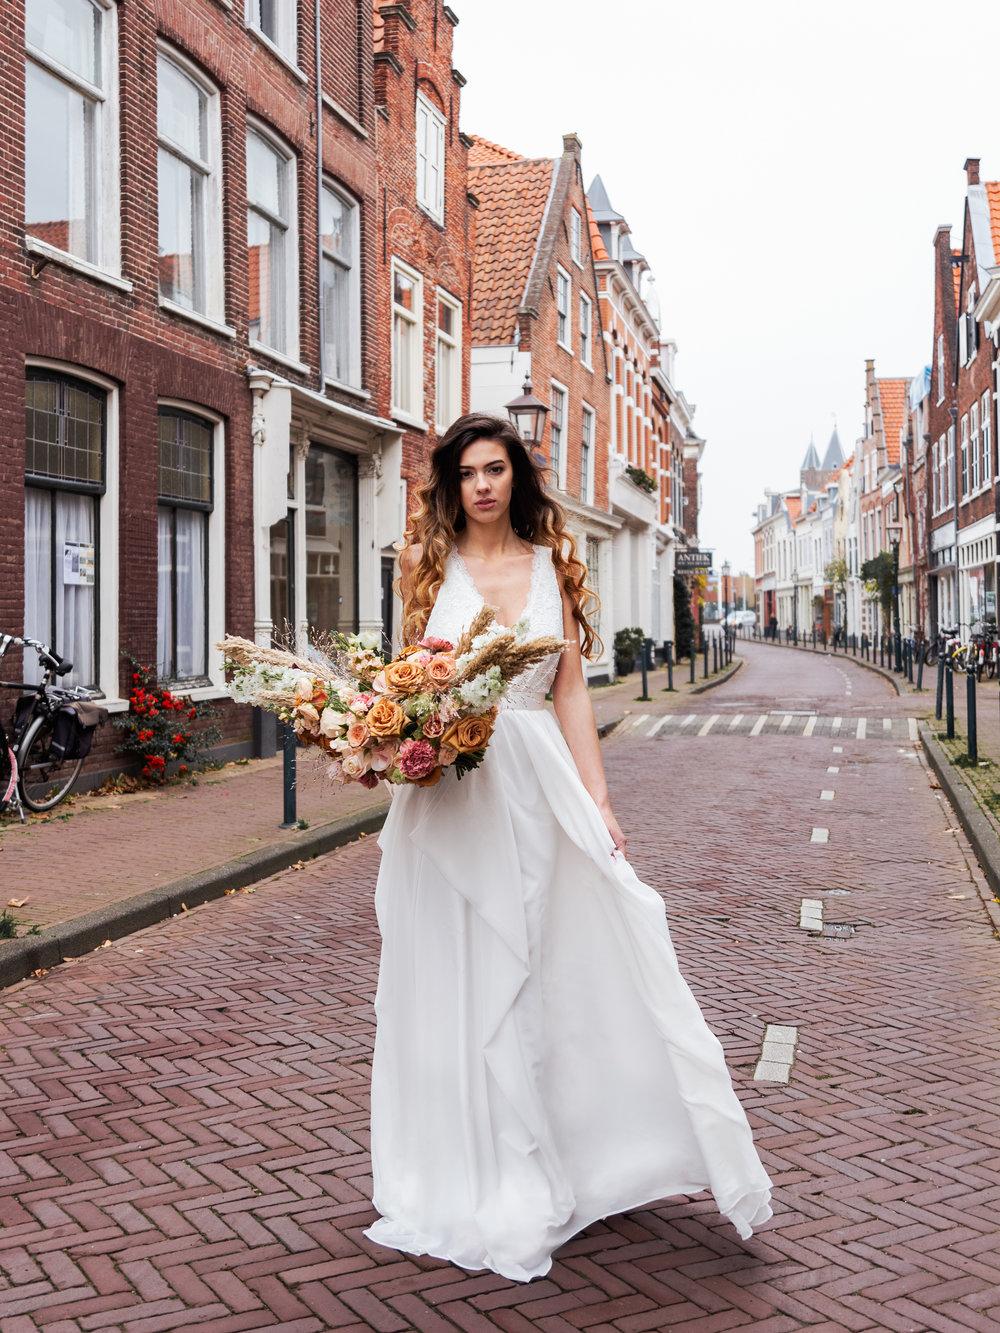 styled-bridal-21.jpg